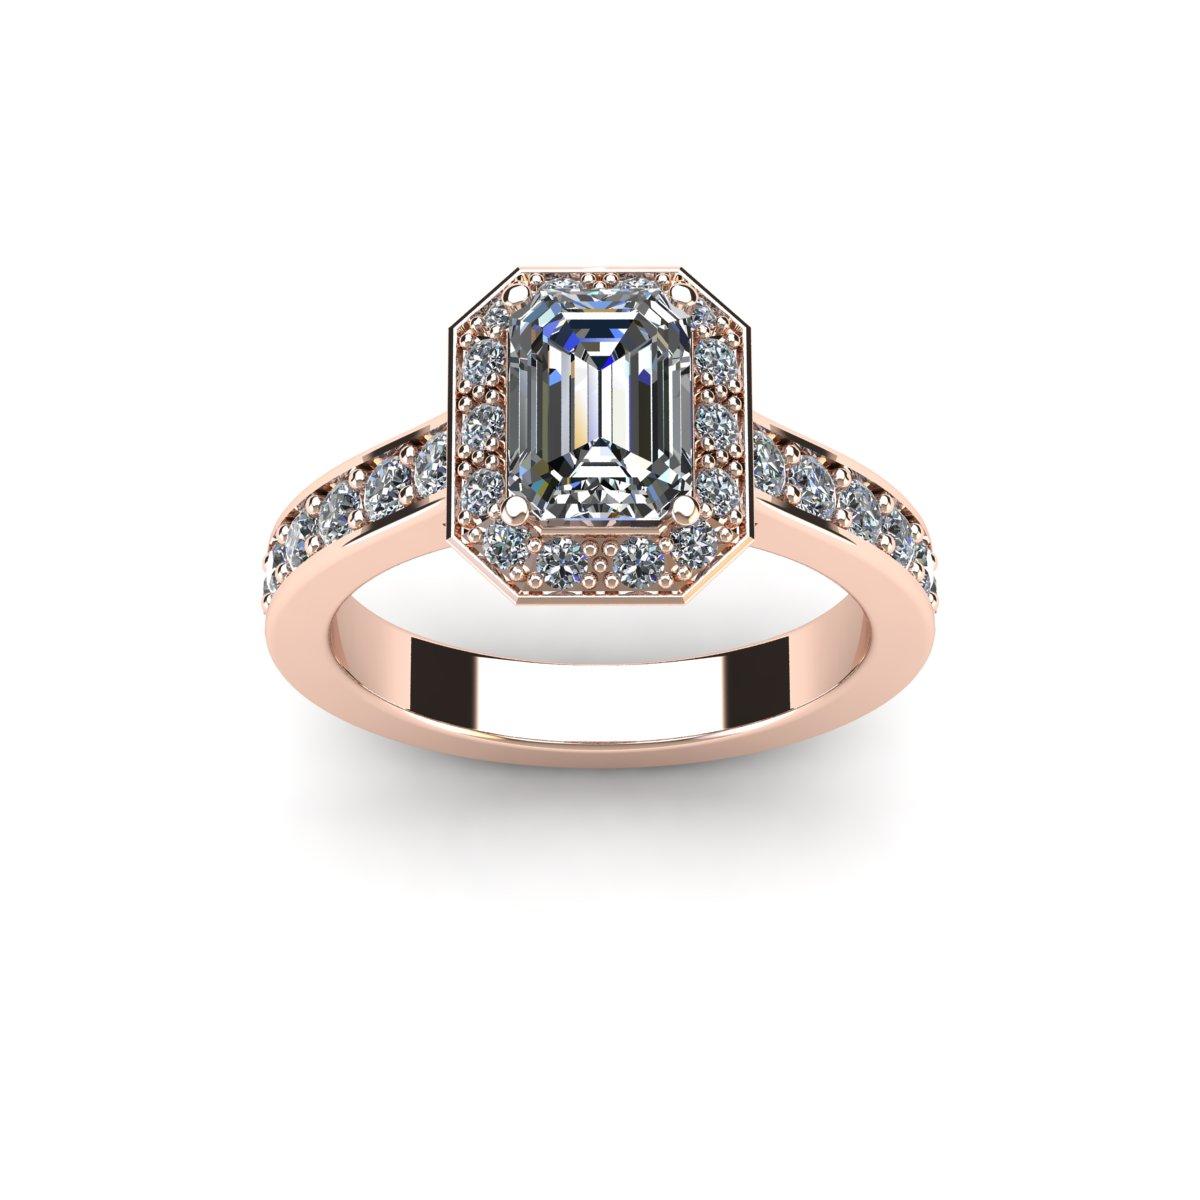 Engagement Ring Trends for 2016 Diamondsconz